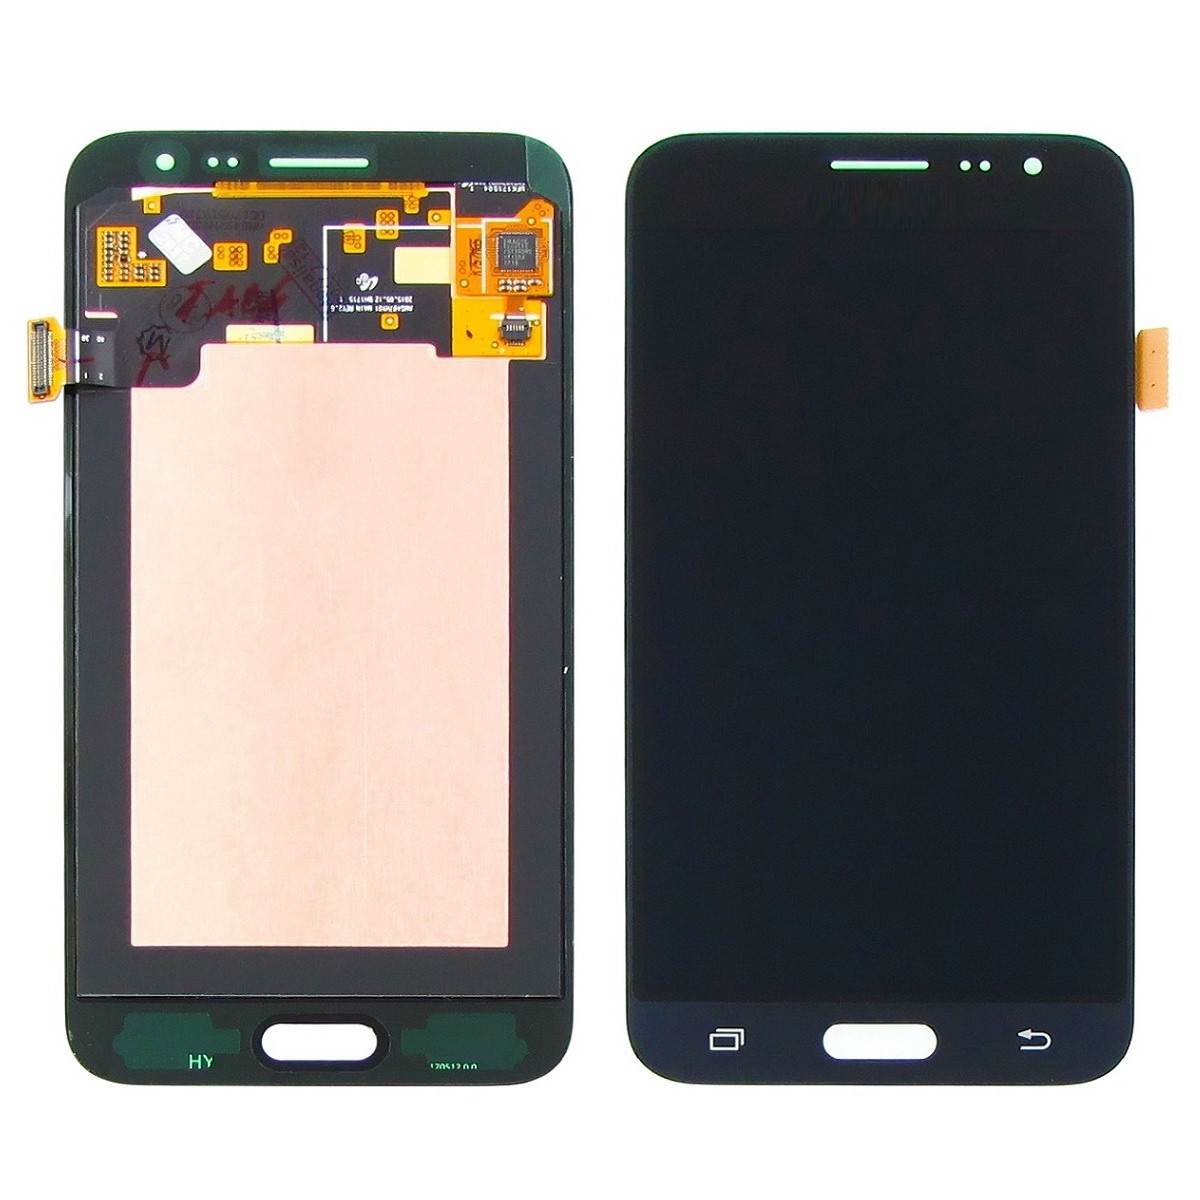 8f1b95e0f68fd Дисплей для Samsung J300 Galaxy J3 с чёрным тачскрином оригинал ...